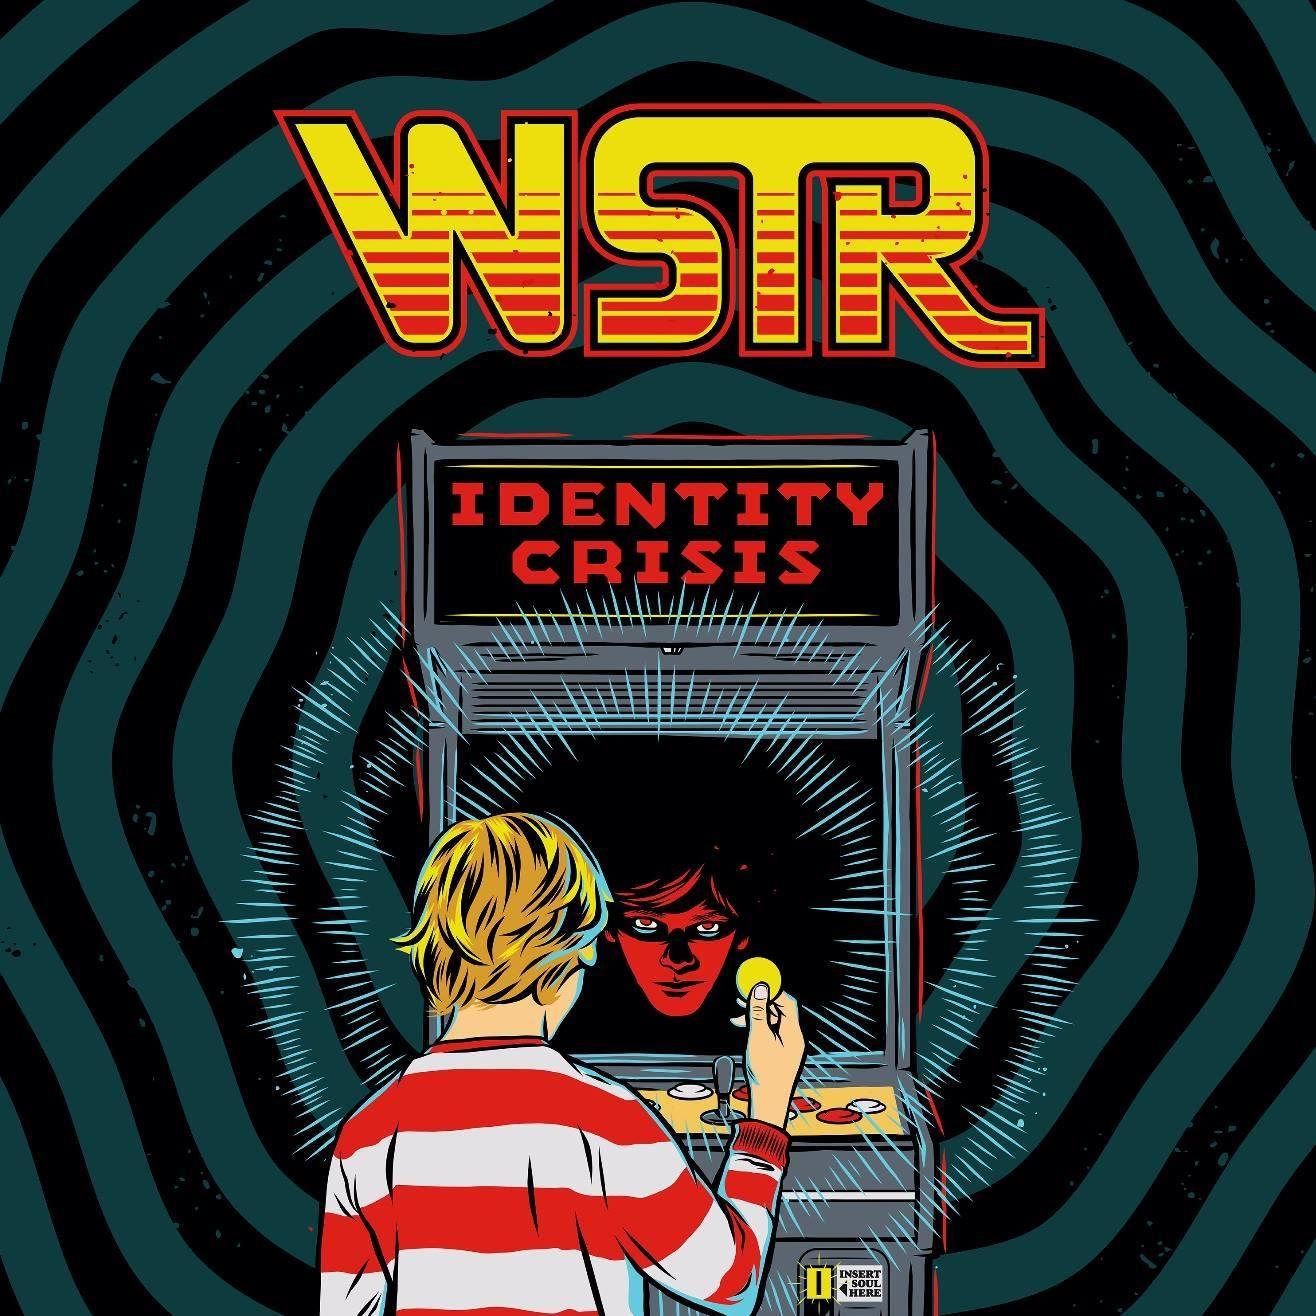 wstr identity crisis